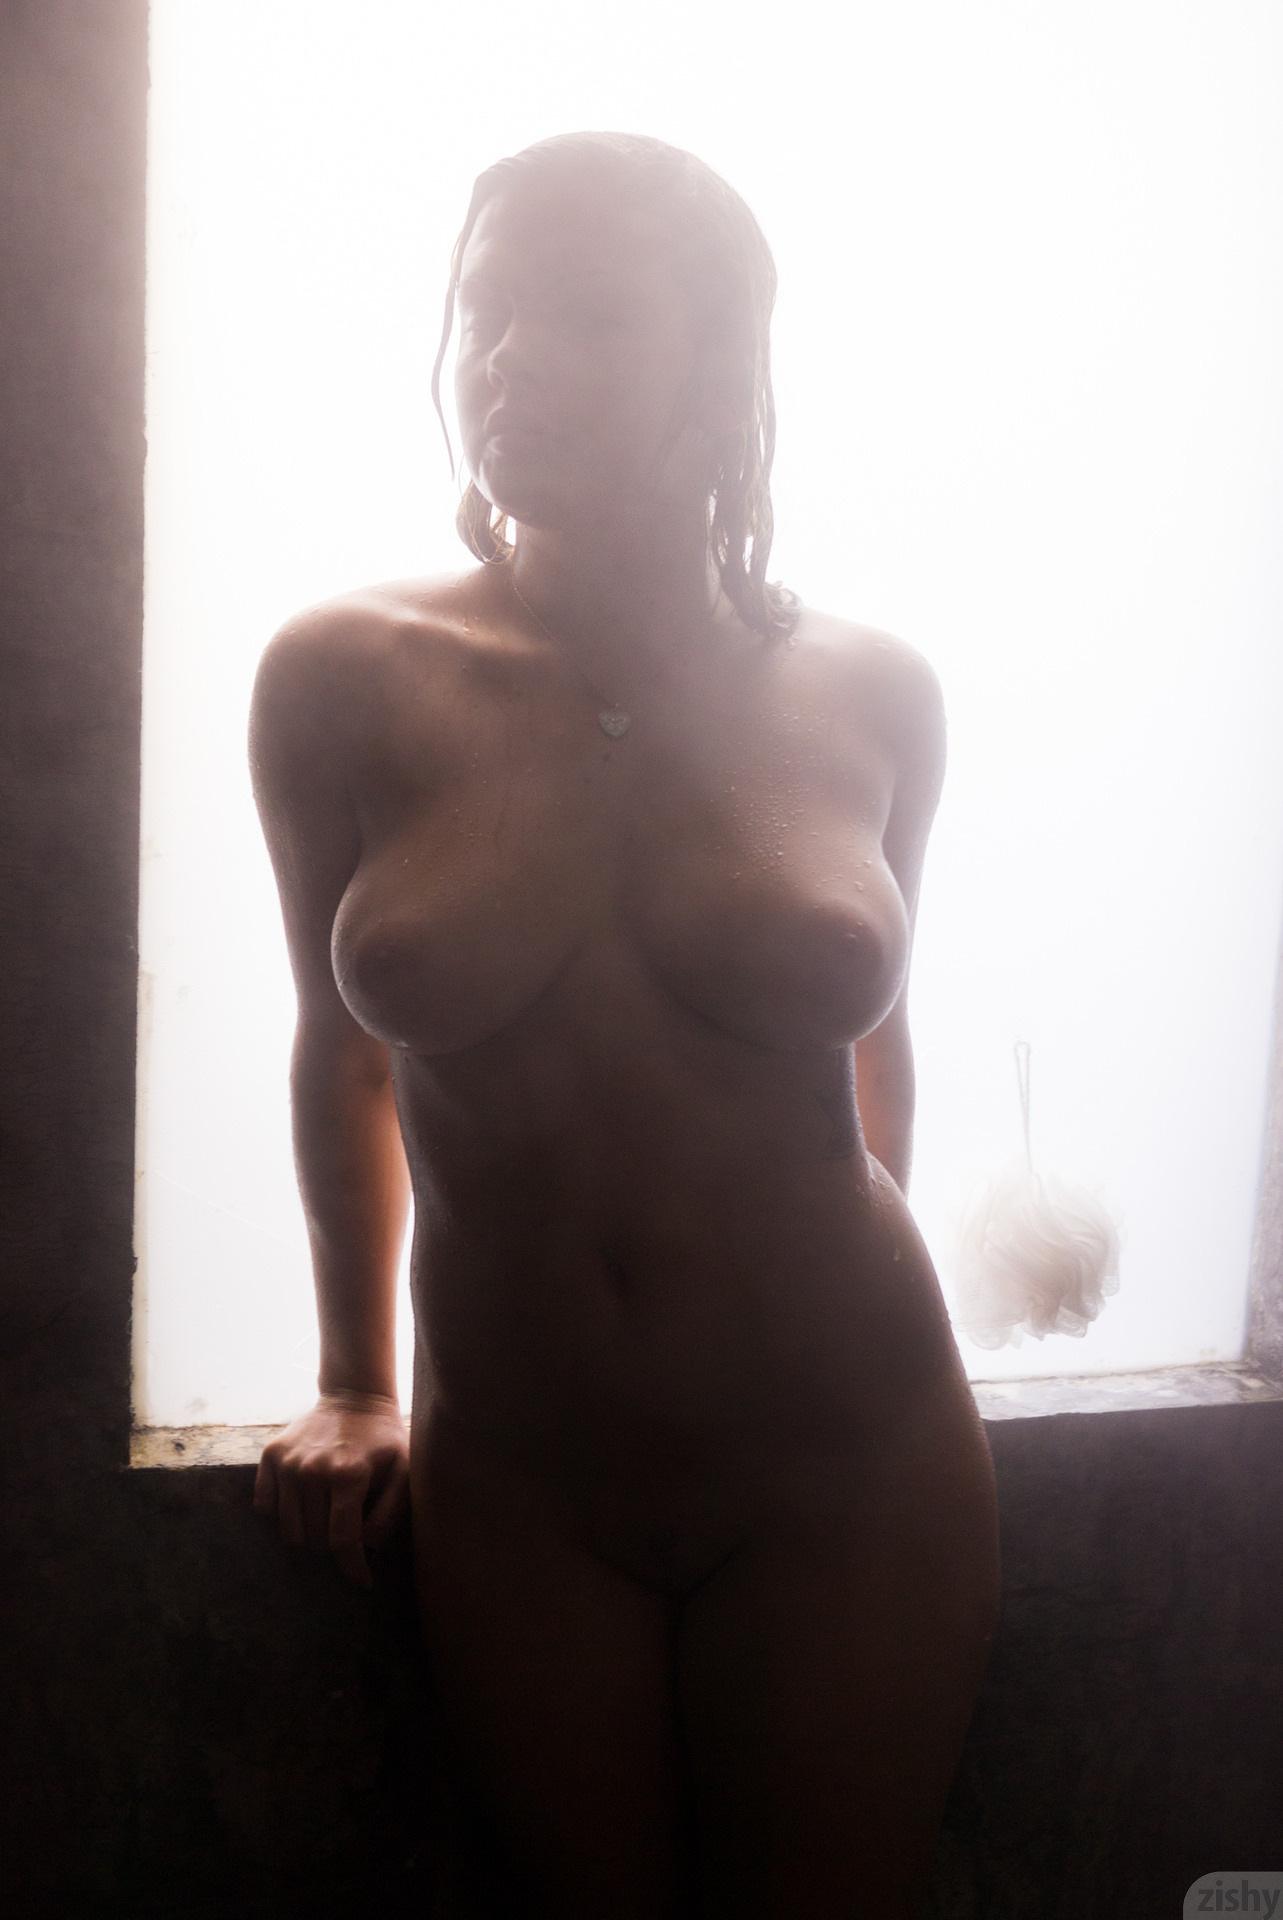 Keisha Grey Drop The Soap Zishy (33)